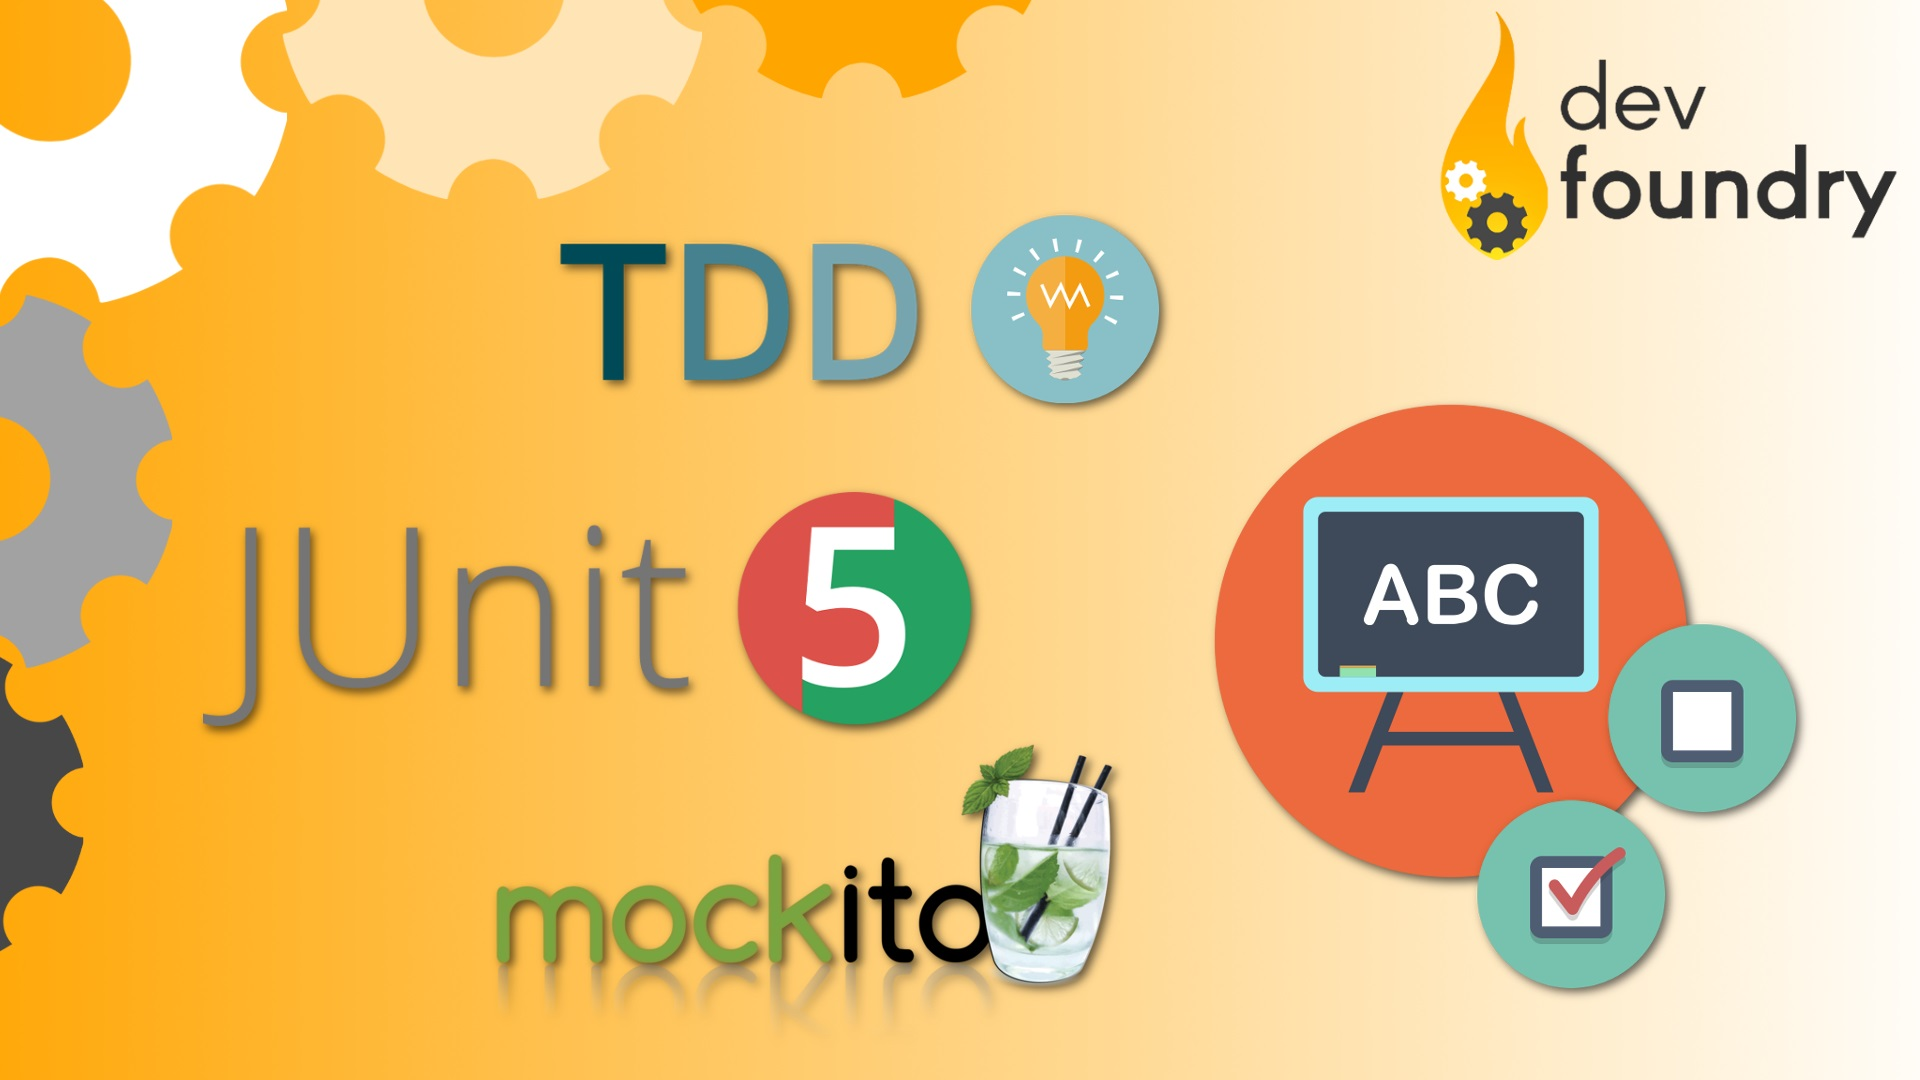 testy jednostkowe junit mockito tdd dev foundry blog programowanie java spring kursy